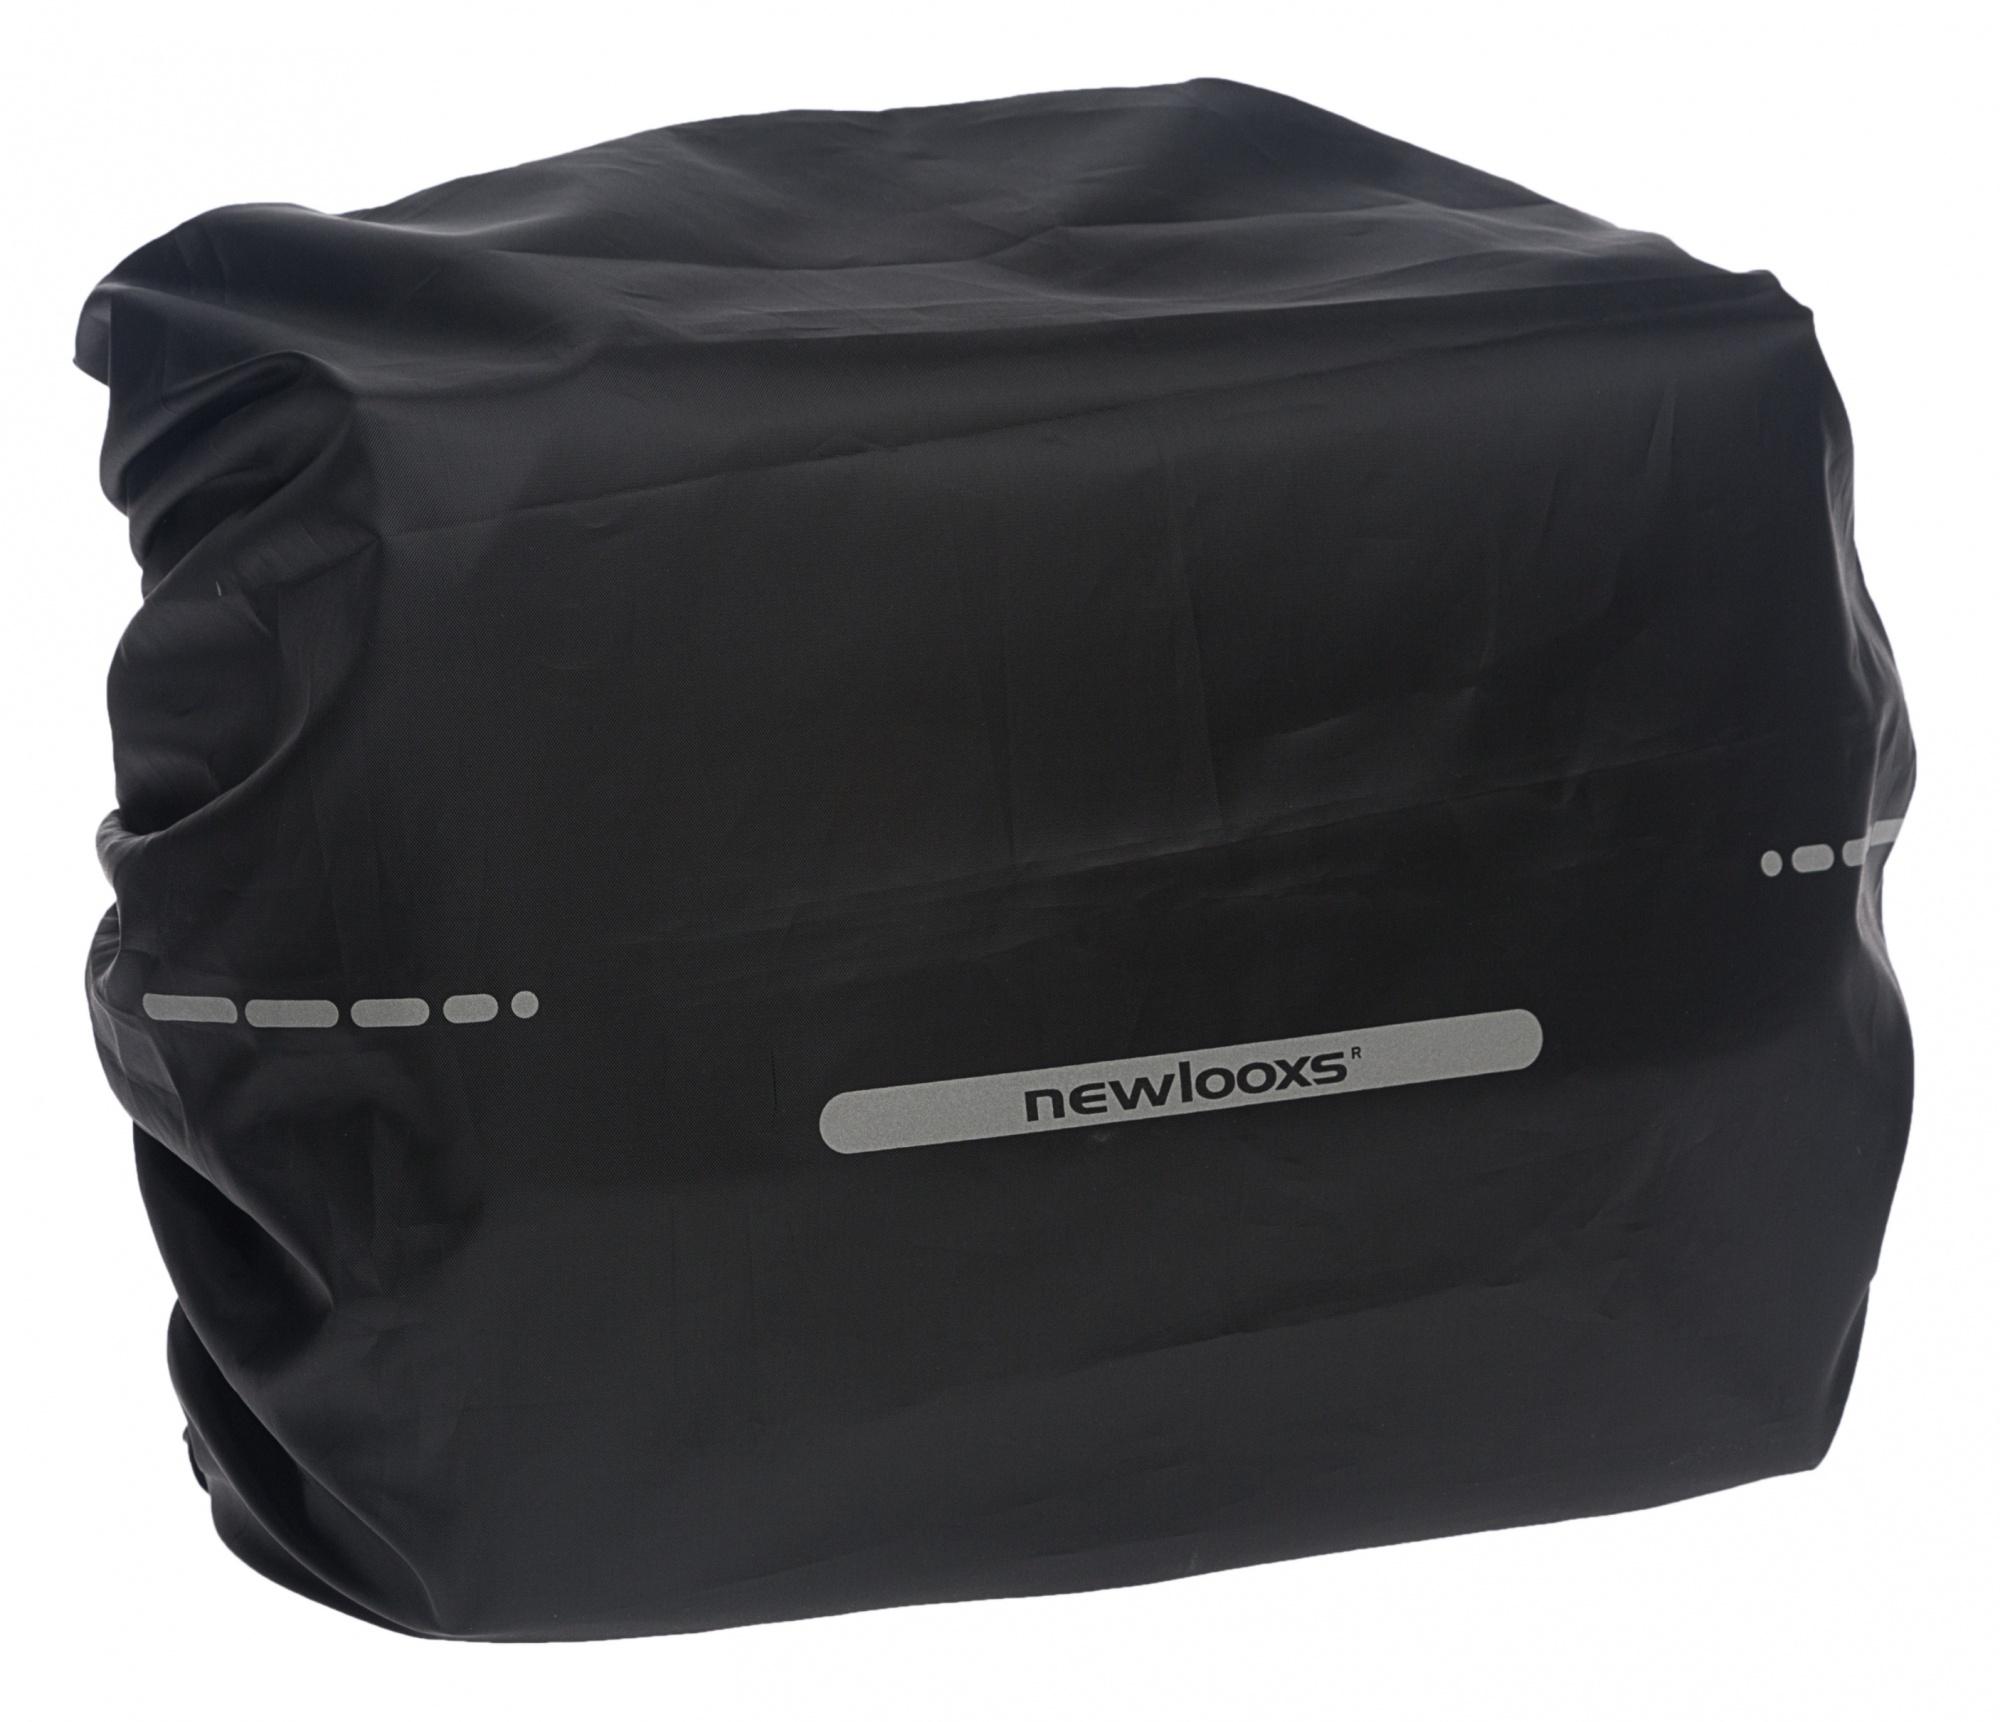 f98e3c76edf New Looxs regenhoes pakaftas 48 x 55 cm zwart - Internet-Bikes